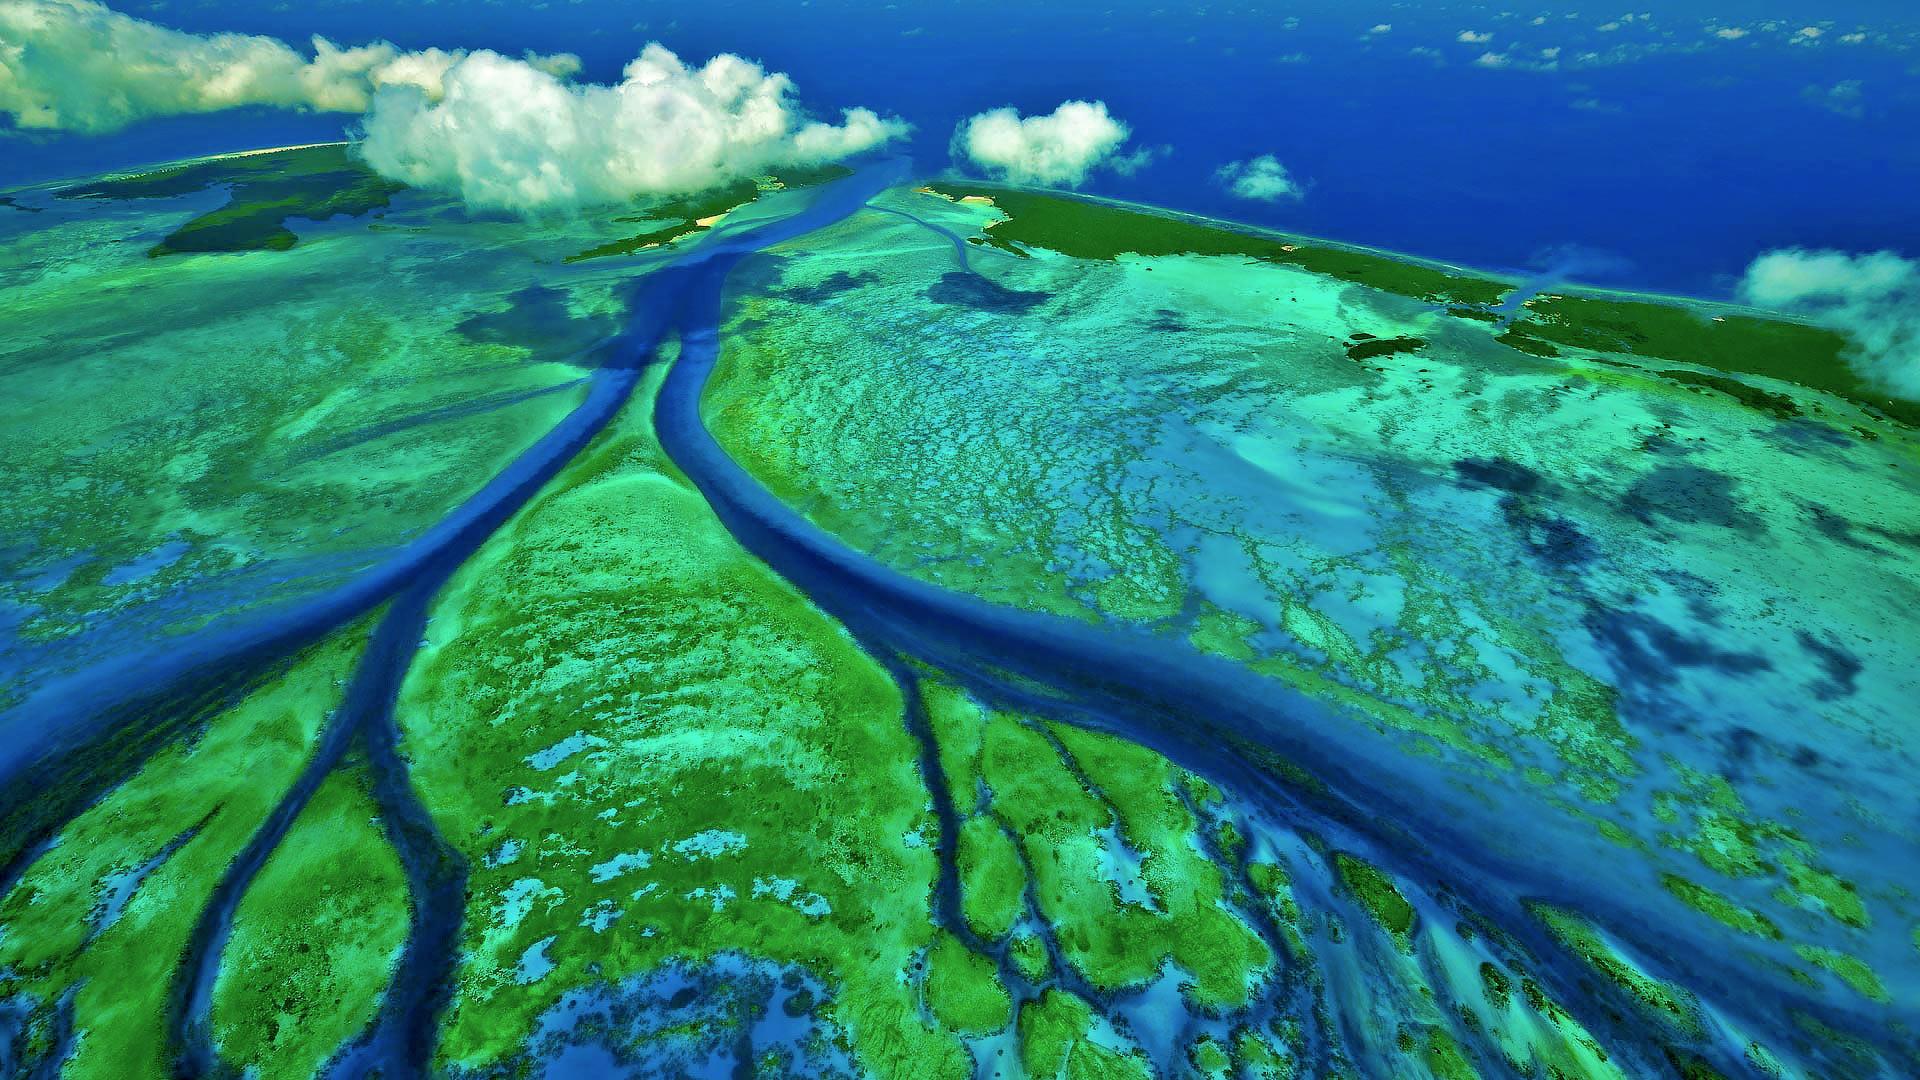 Aldabra Atoll: UNESCO World Heritage at its Best